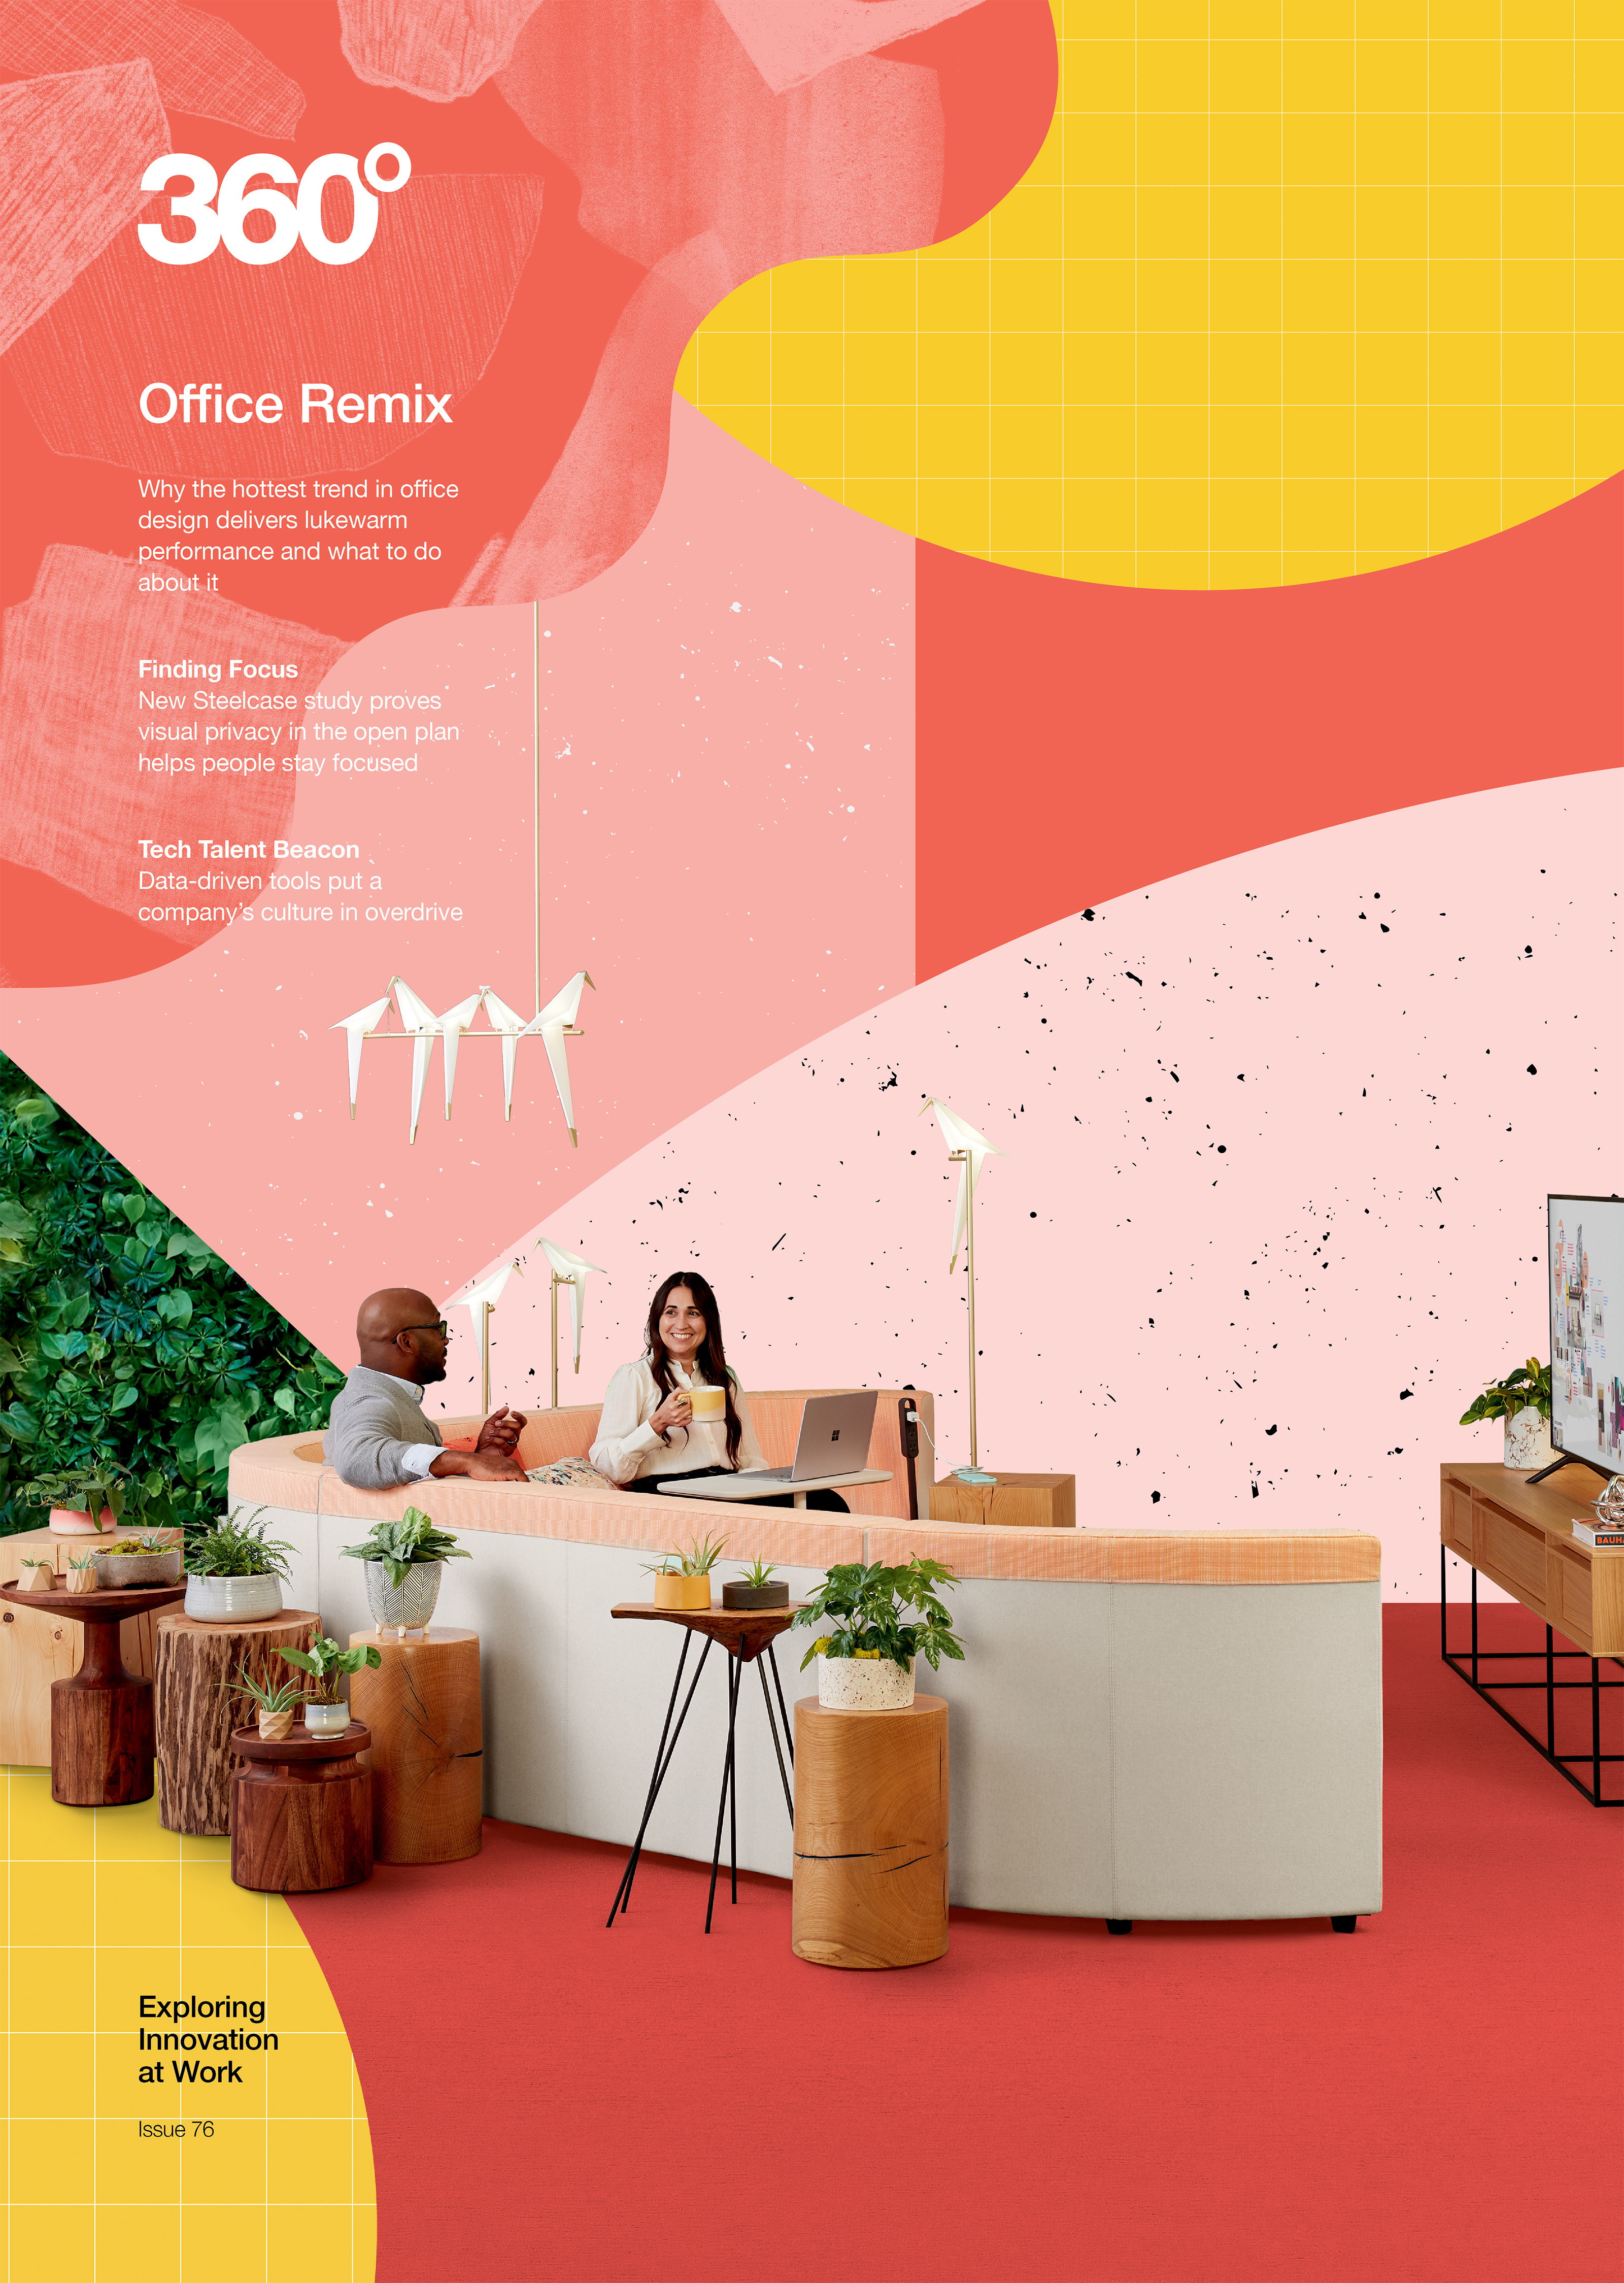 Office Remix Steelcase